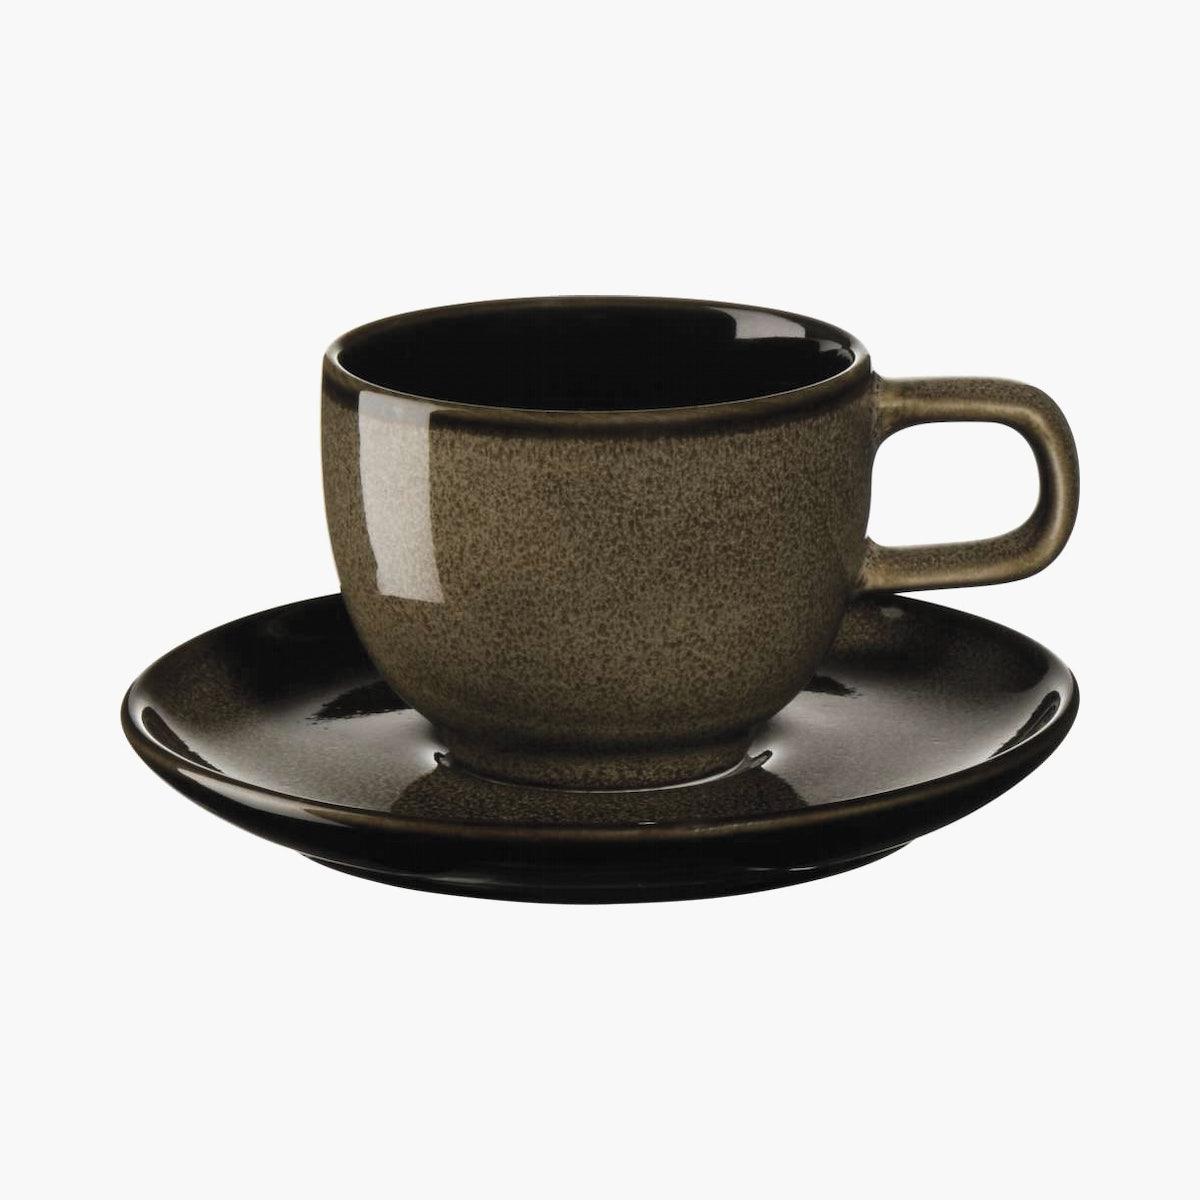 Kolibri Espresso Cup with Saucer